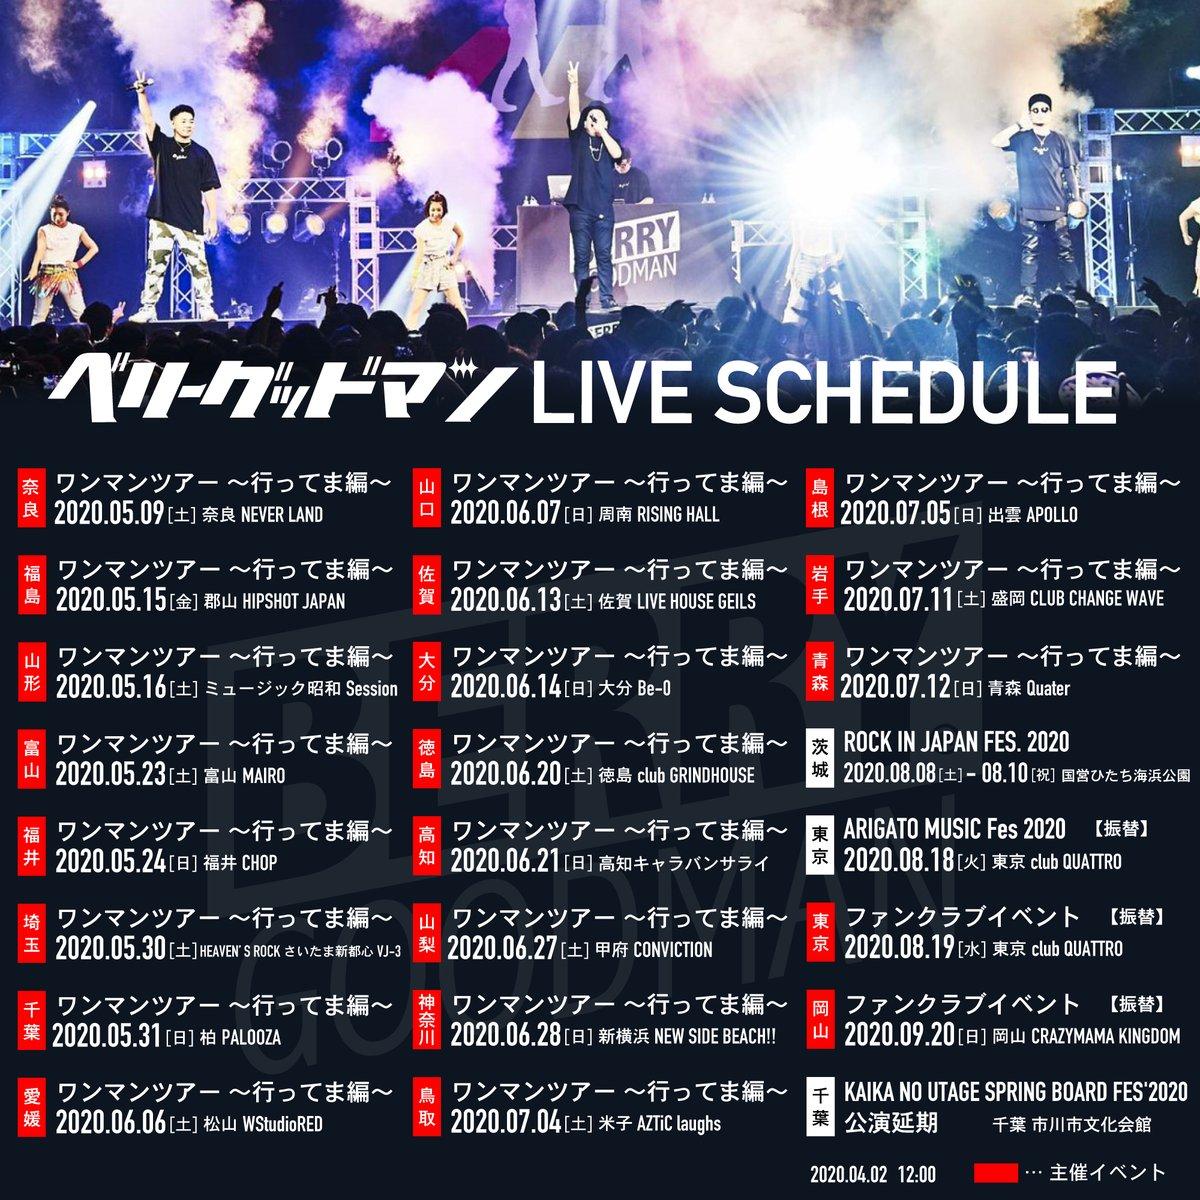 test ツイッターメディア - 【 🆕 LIVE 】 . 『 ROCK IN JAPAN FES.2020』出演決定✨ 📆8月8日(土) - 8月10日(月祝) ⏰OPEN 8:00 / START 10:30 📍茨城・国営ひたち海浜公園 https://t.co/w4Yq3c2PhA . . 出演日は後日発表致させて頂きます🙋♀️ #RIJ2020 #ロッキン https://t.co/aAAQ4839t7